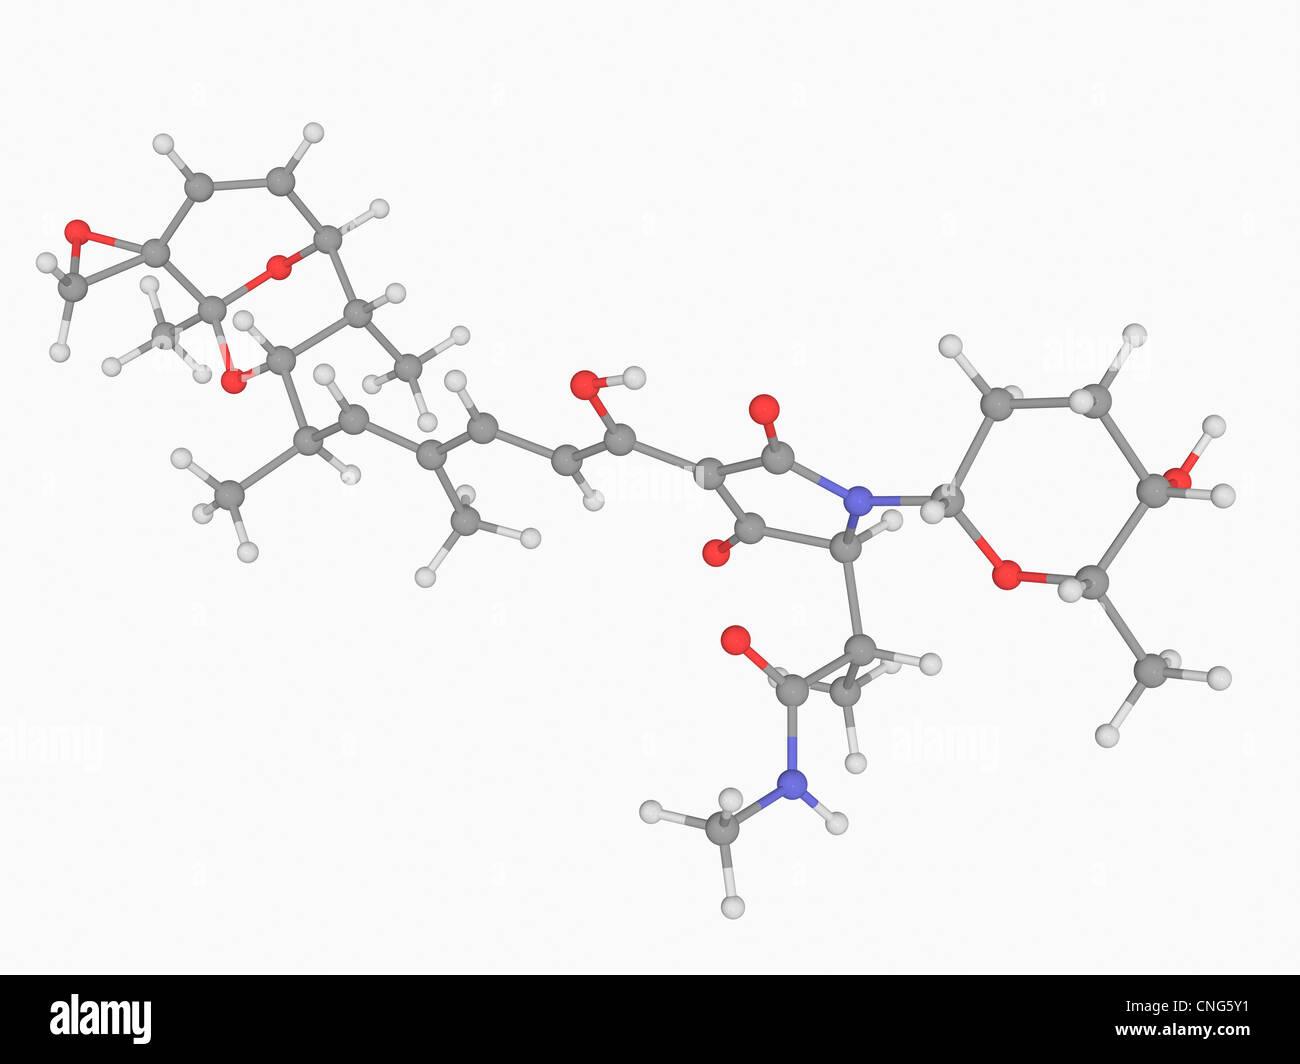 Streptolydigin drug molecule - Stock Image